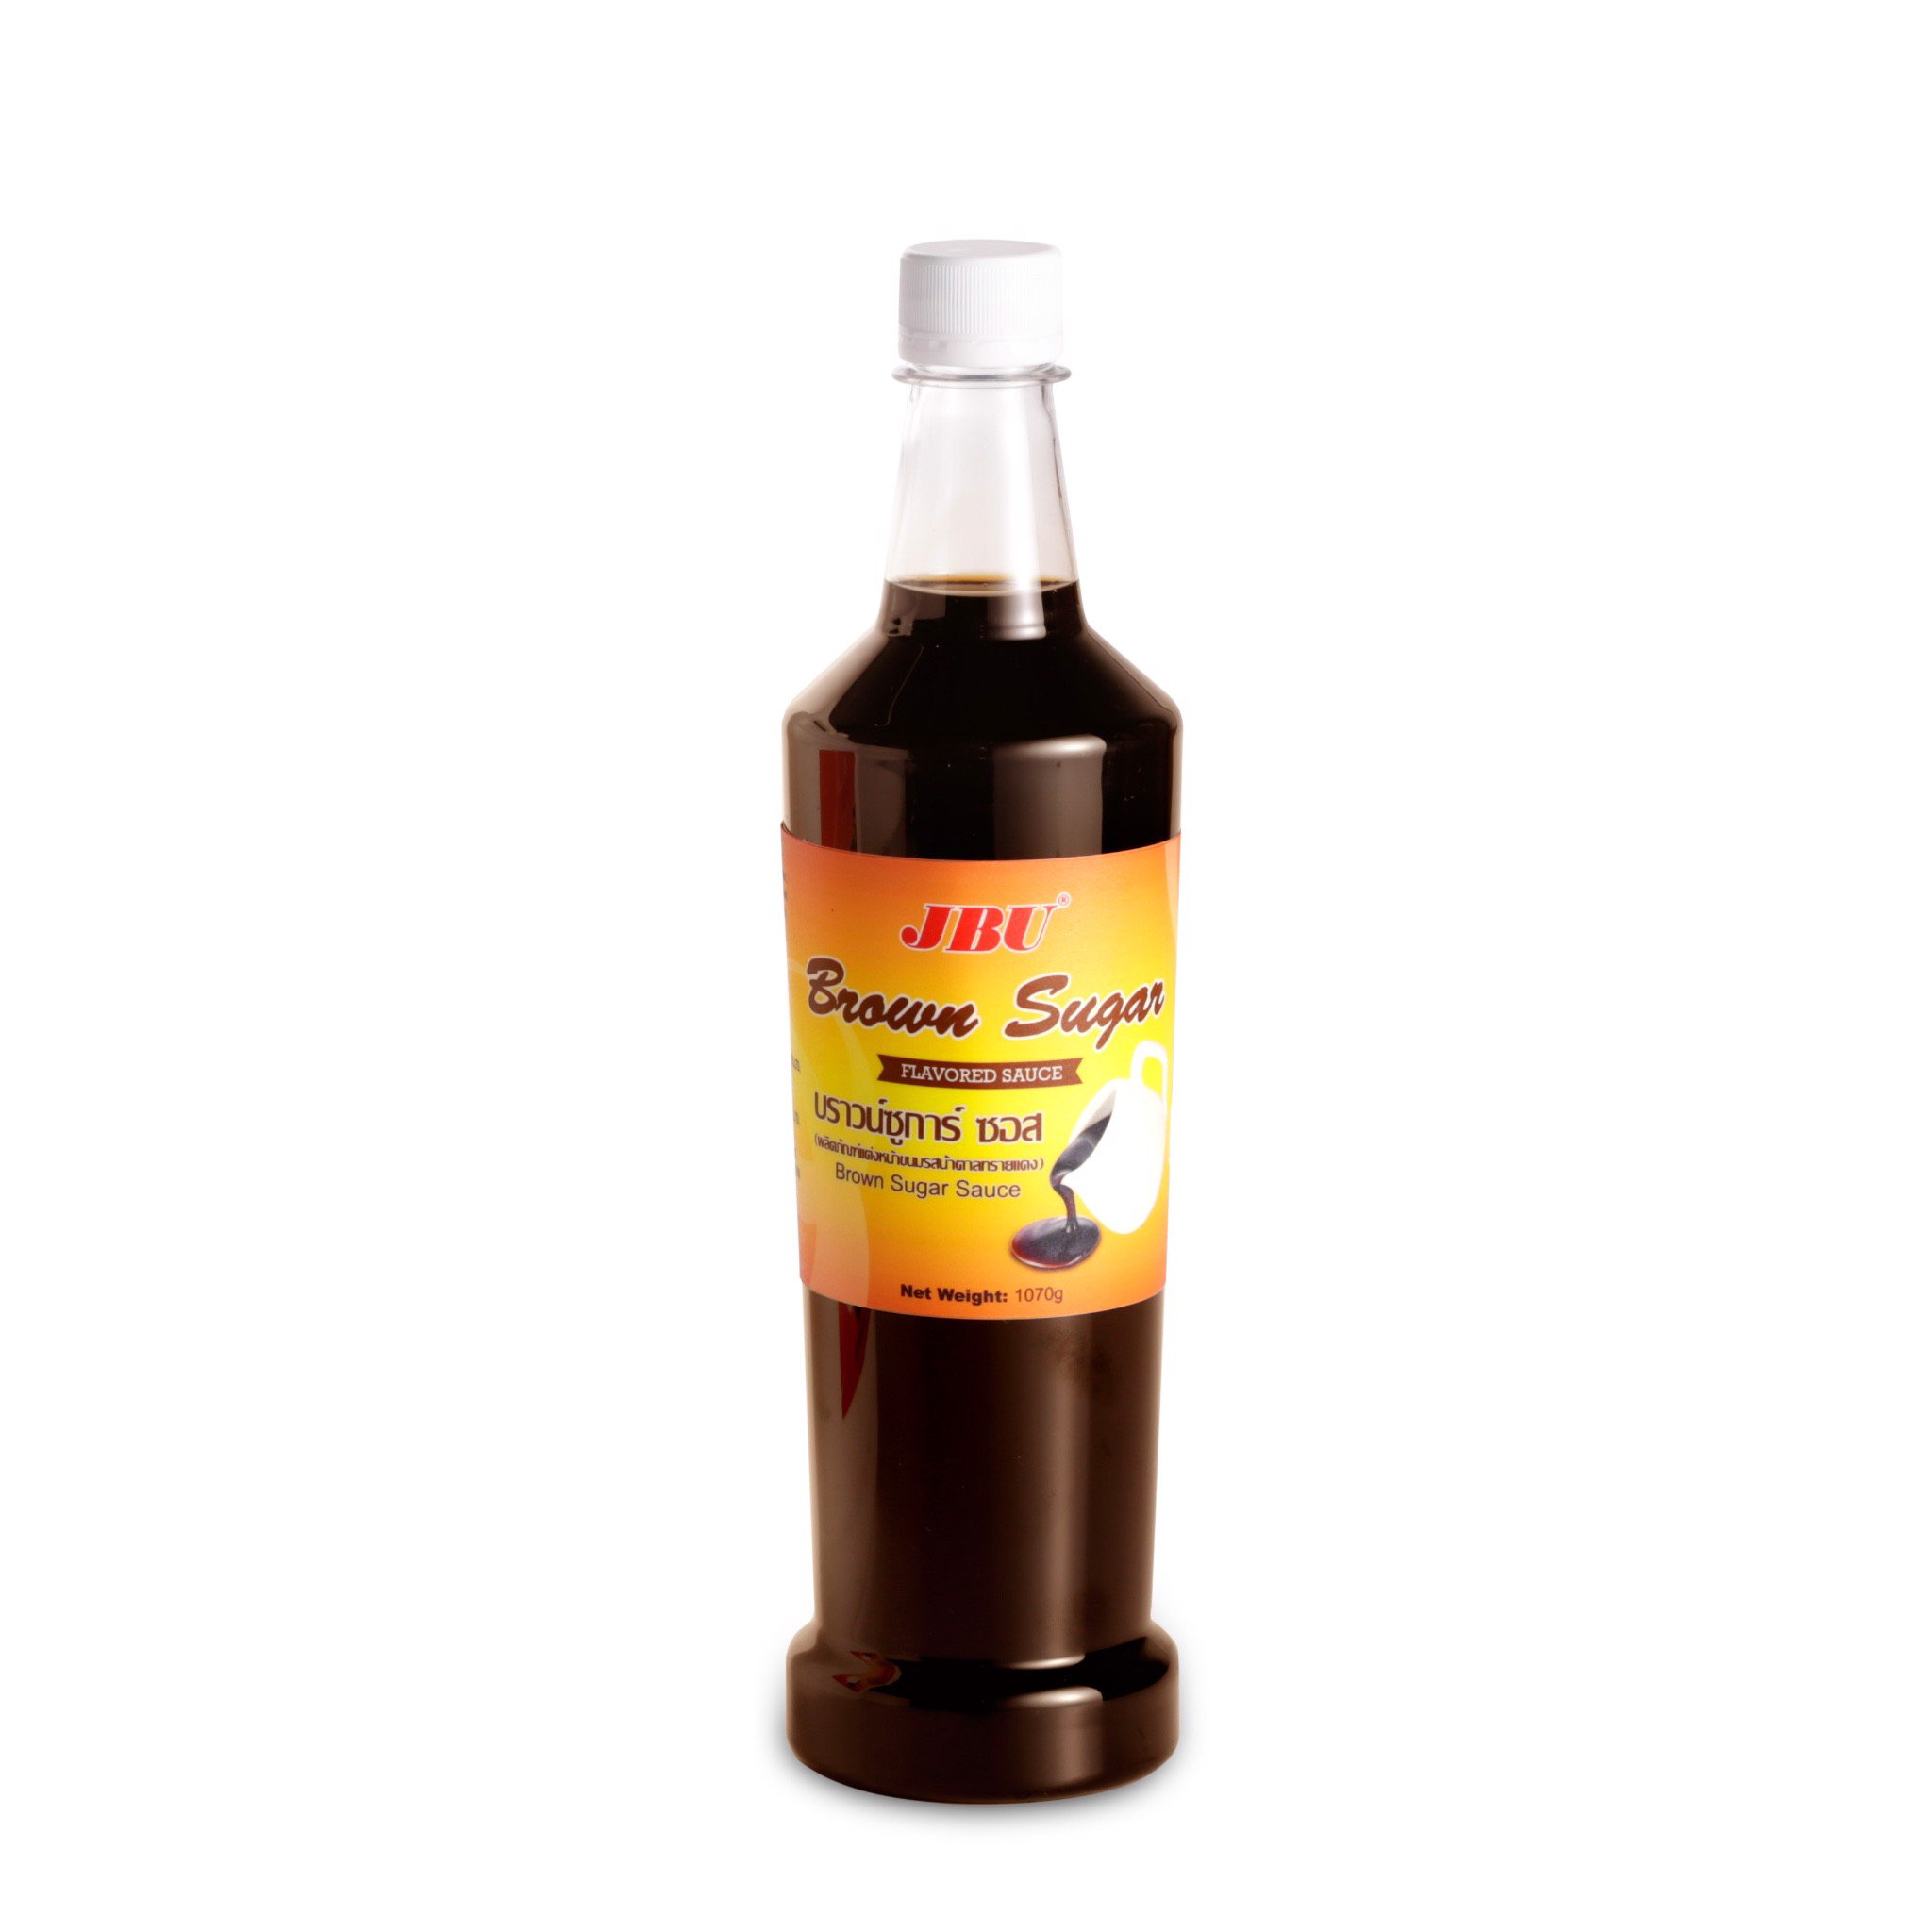 syrup-duong-den-jbu-1l-1070g